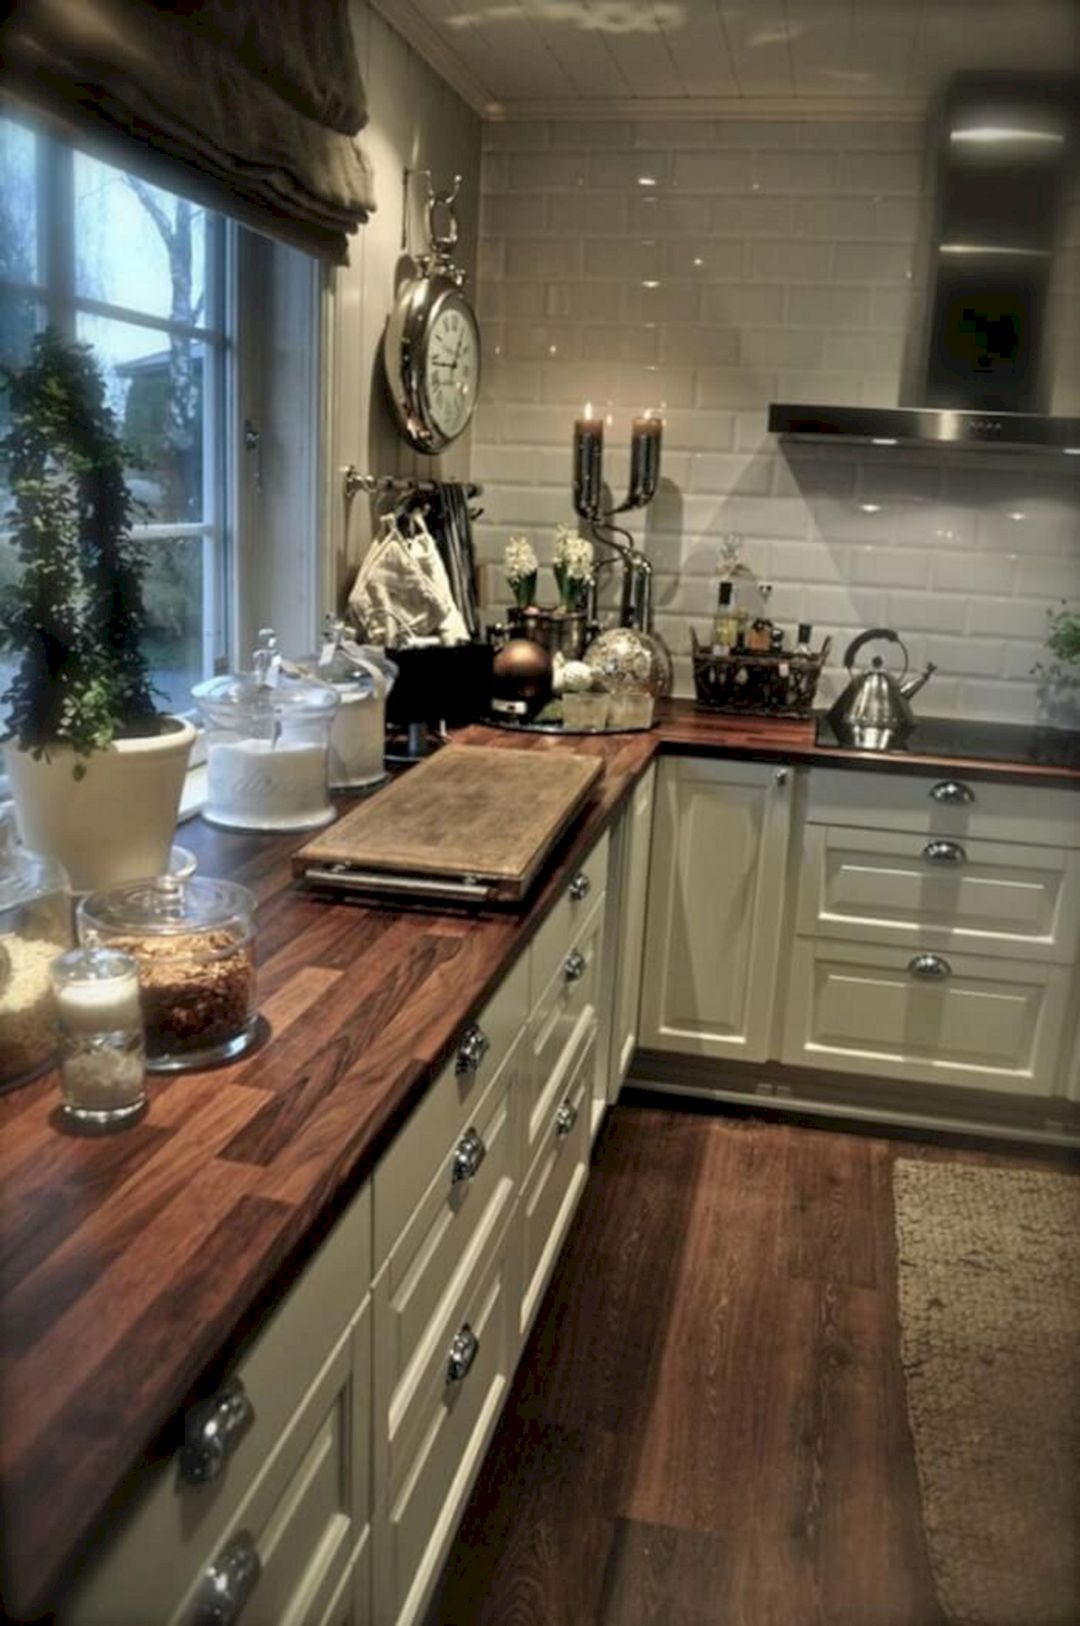 Awesome Farmhouse Kitchen Design Ideas (75+ Pictures) | H.O.M.E. ...